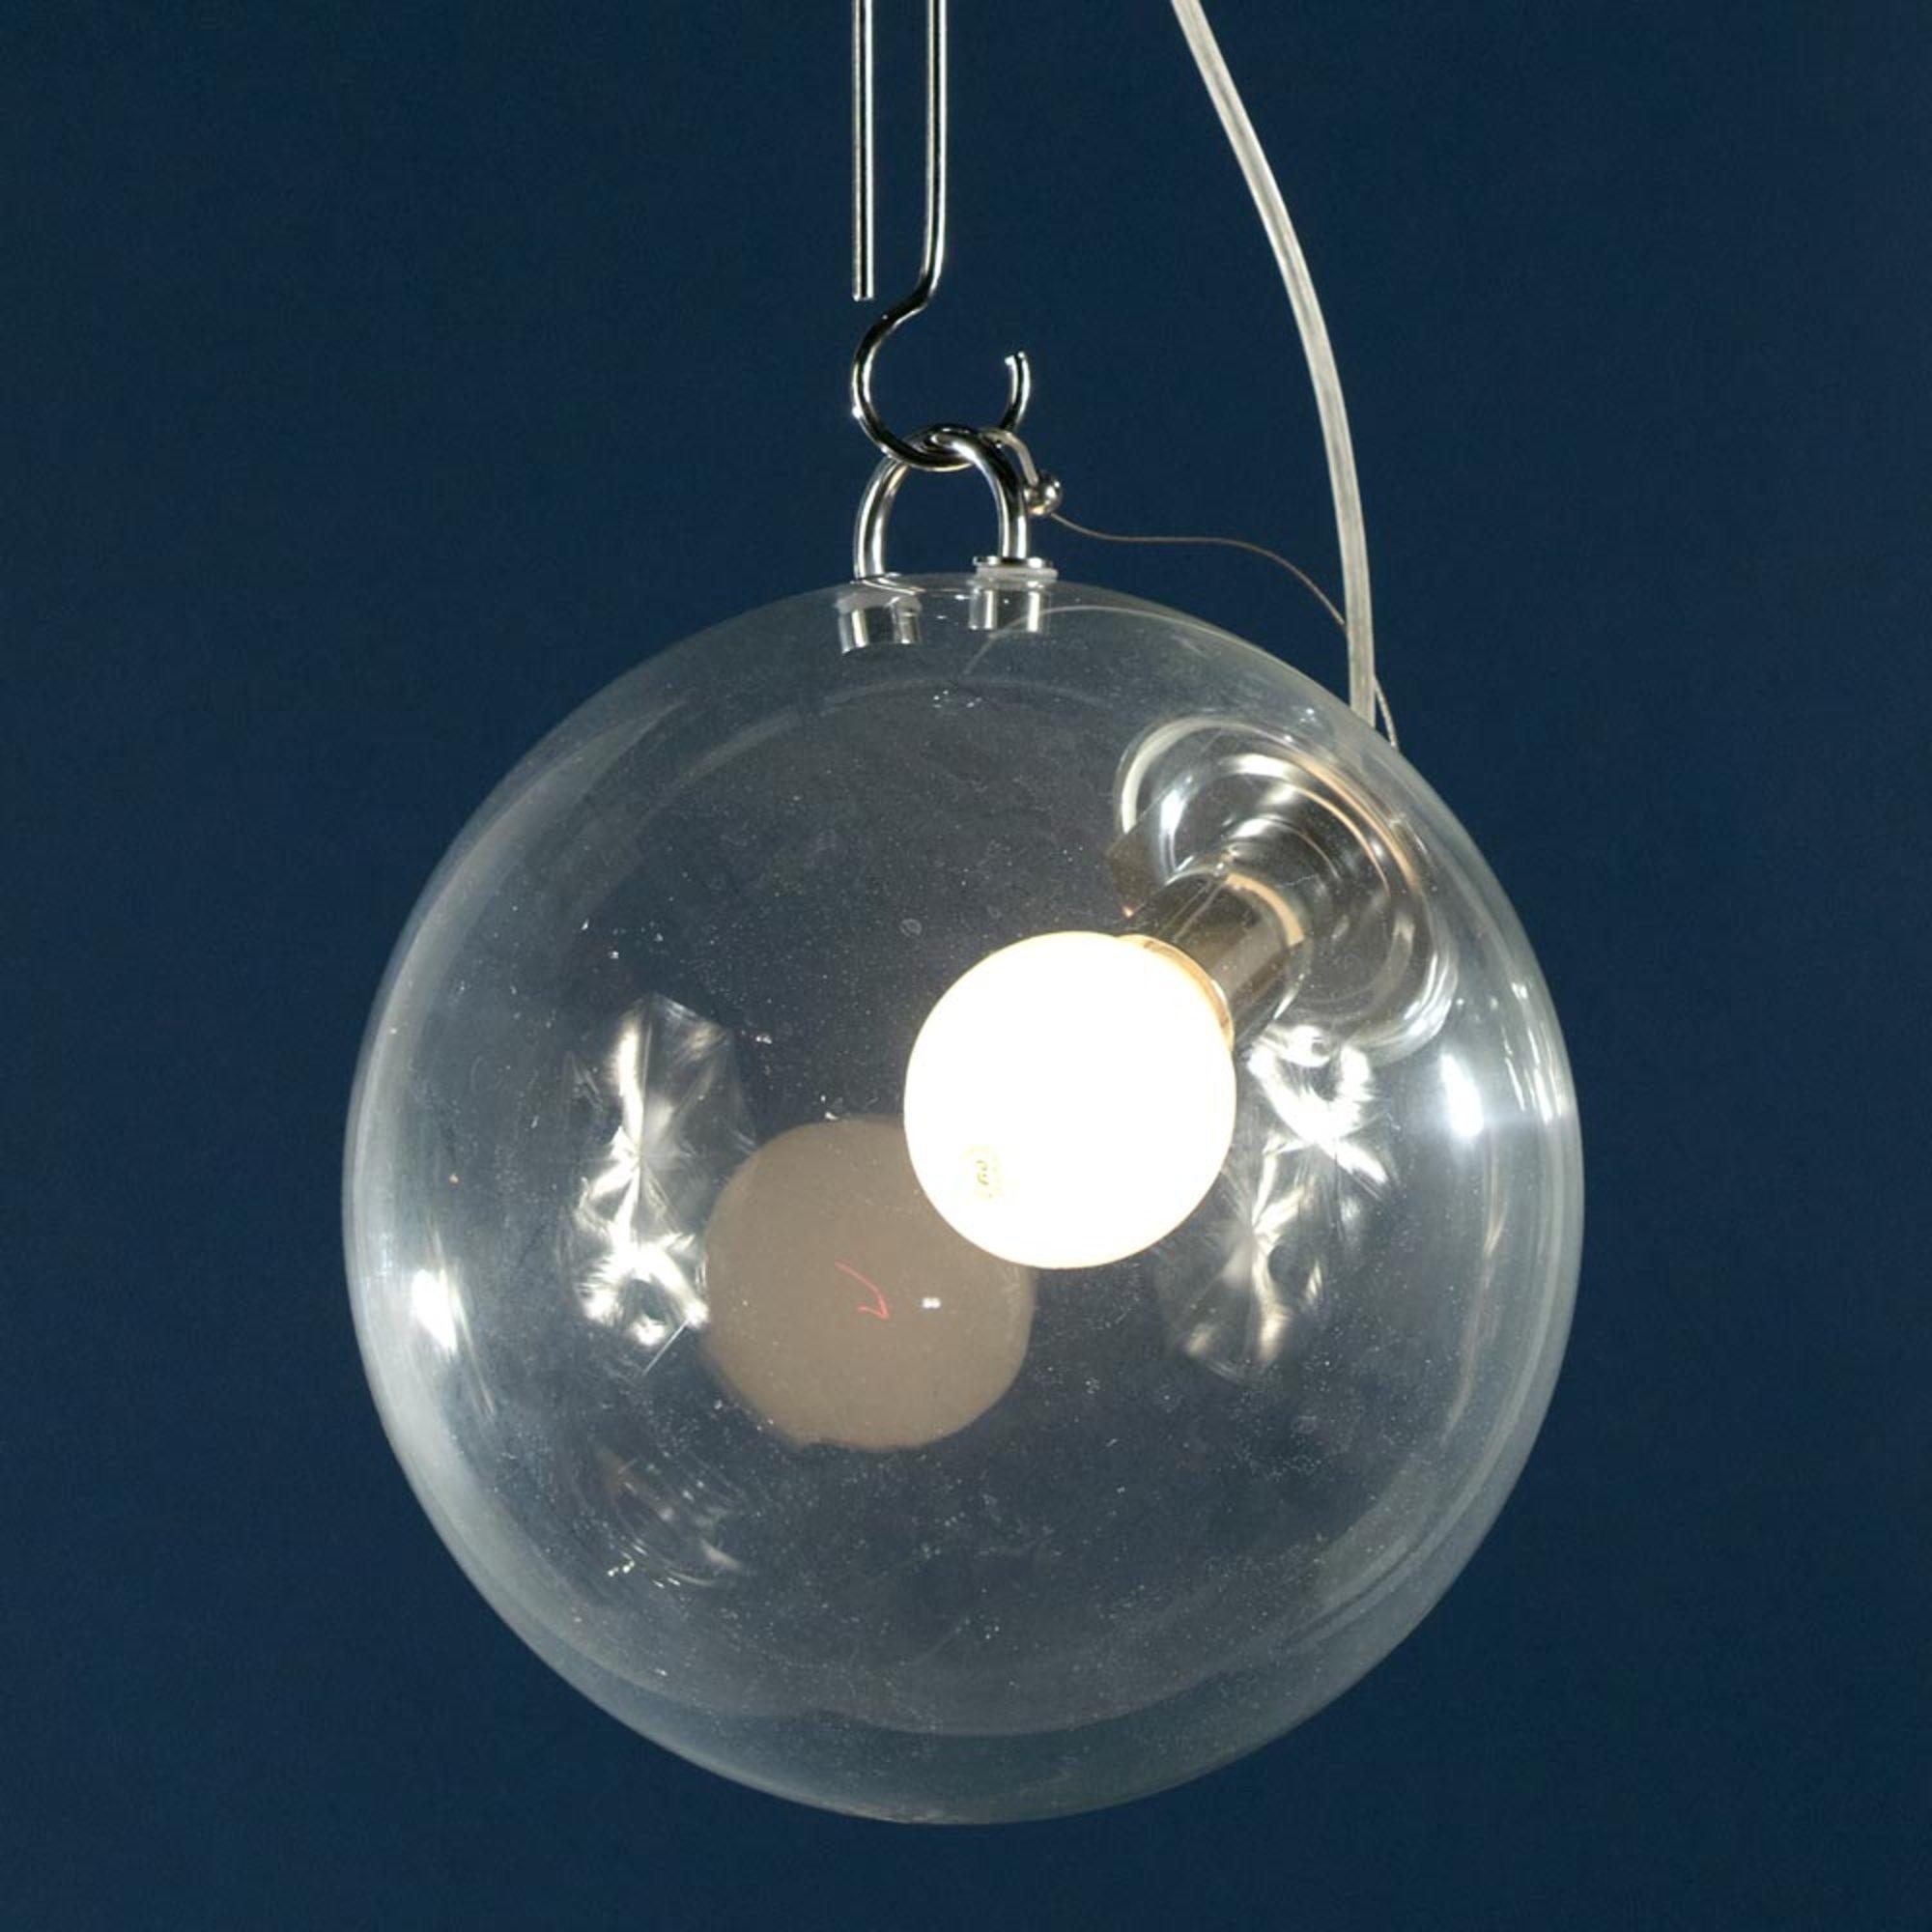 Glass Sphere Ceiling Light - Silver